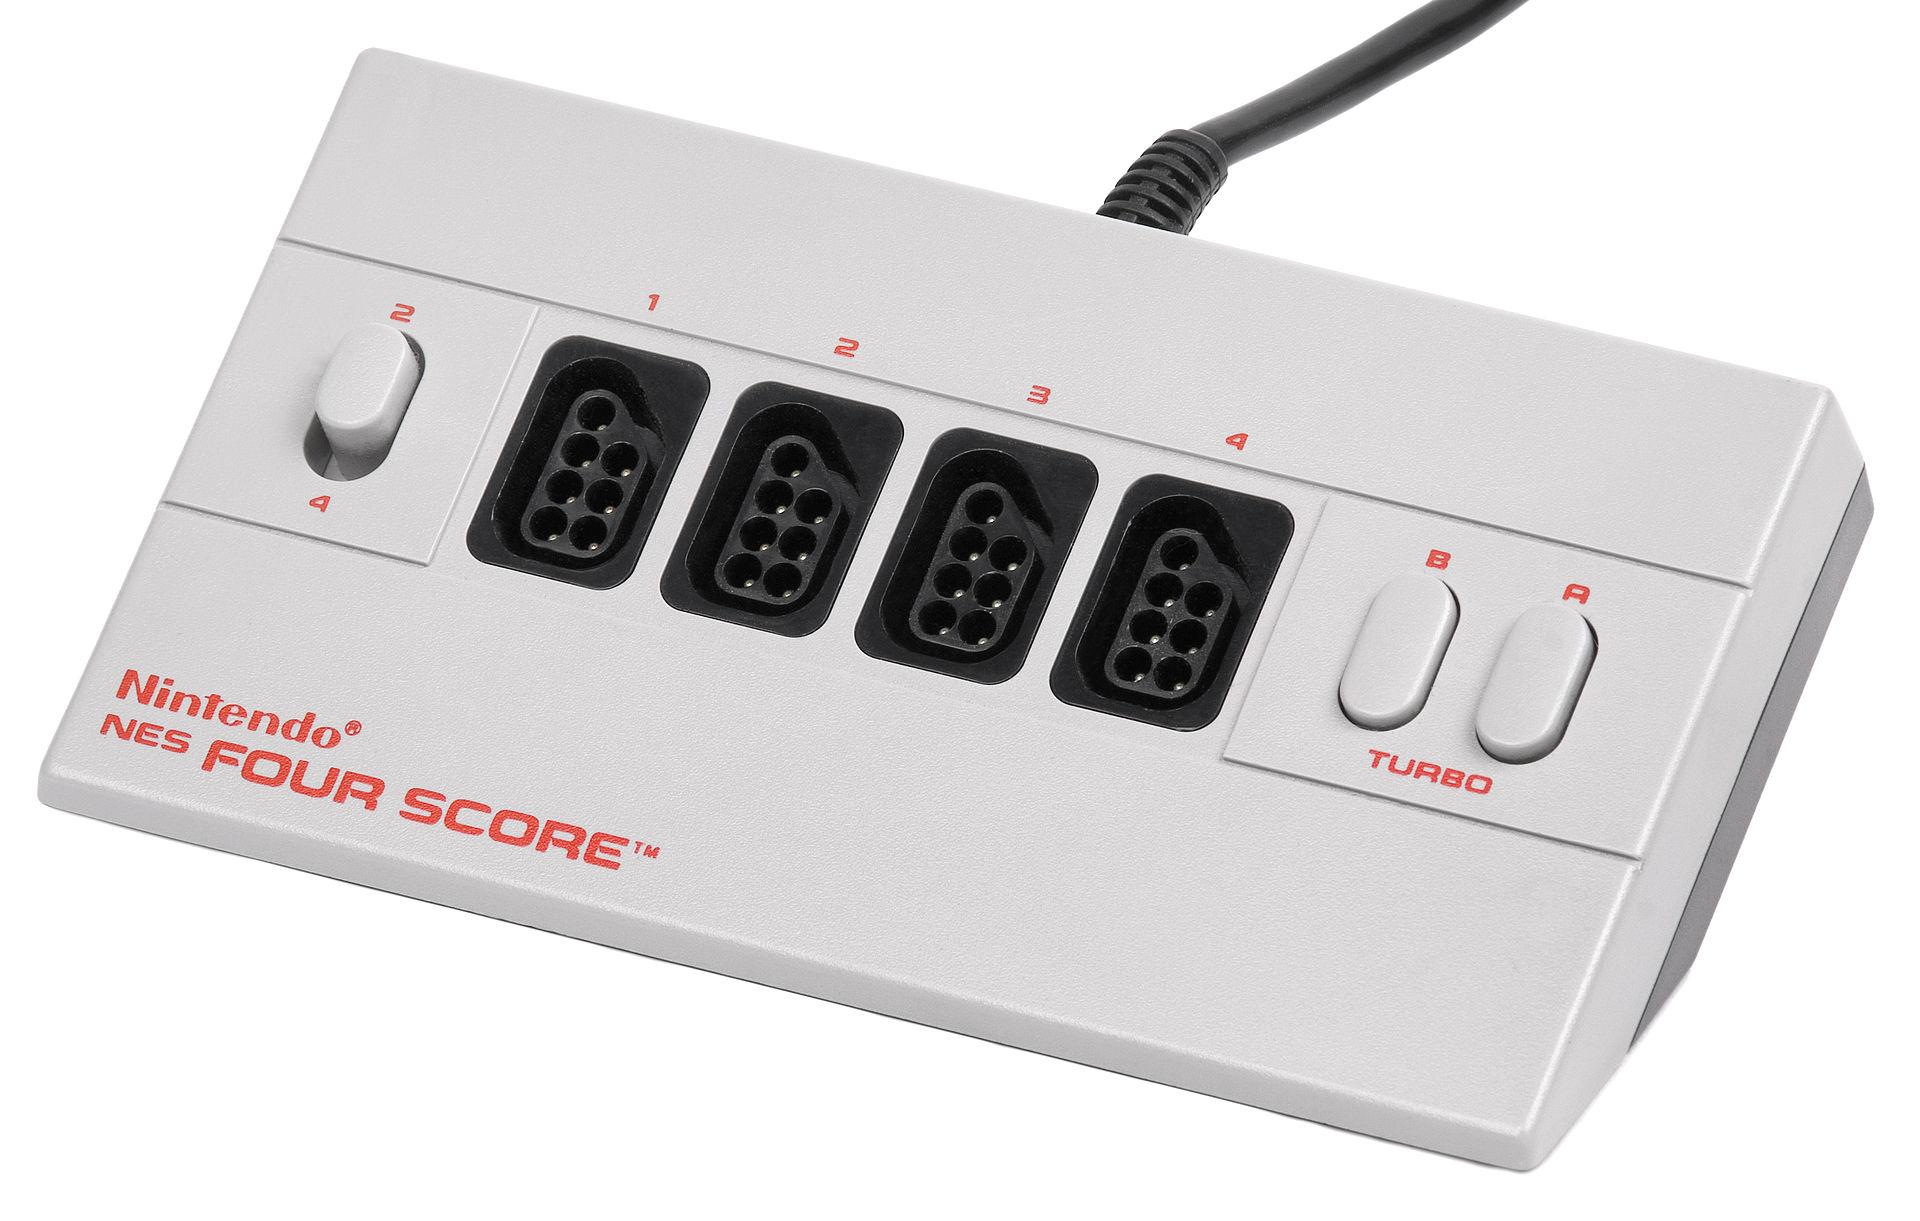 NES-Four-Score.jpg